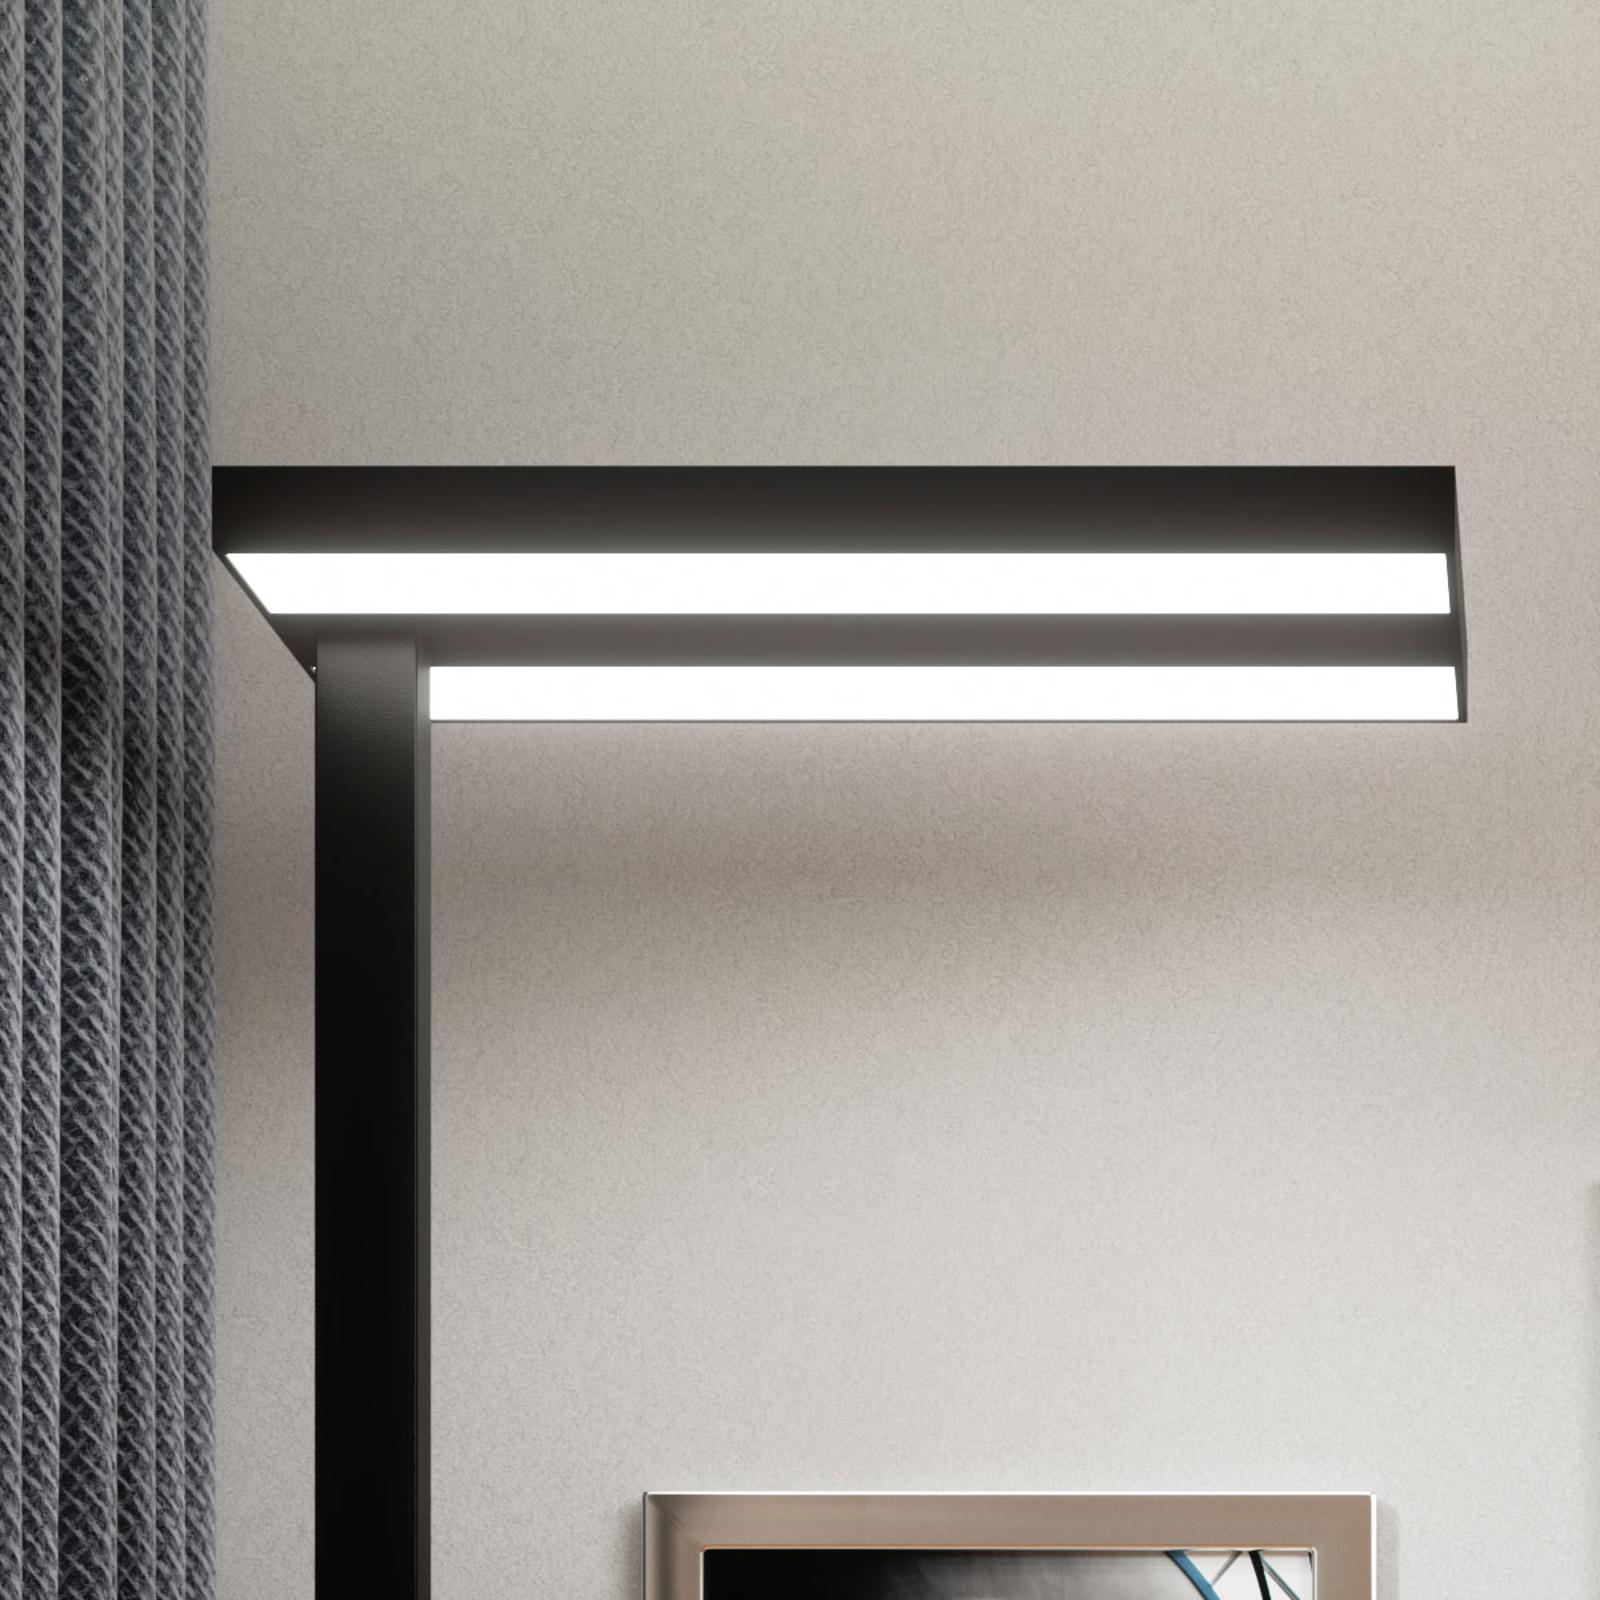 LED Office vloerlamp Logan in zwart, dimbaar